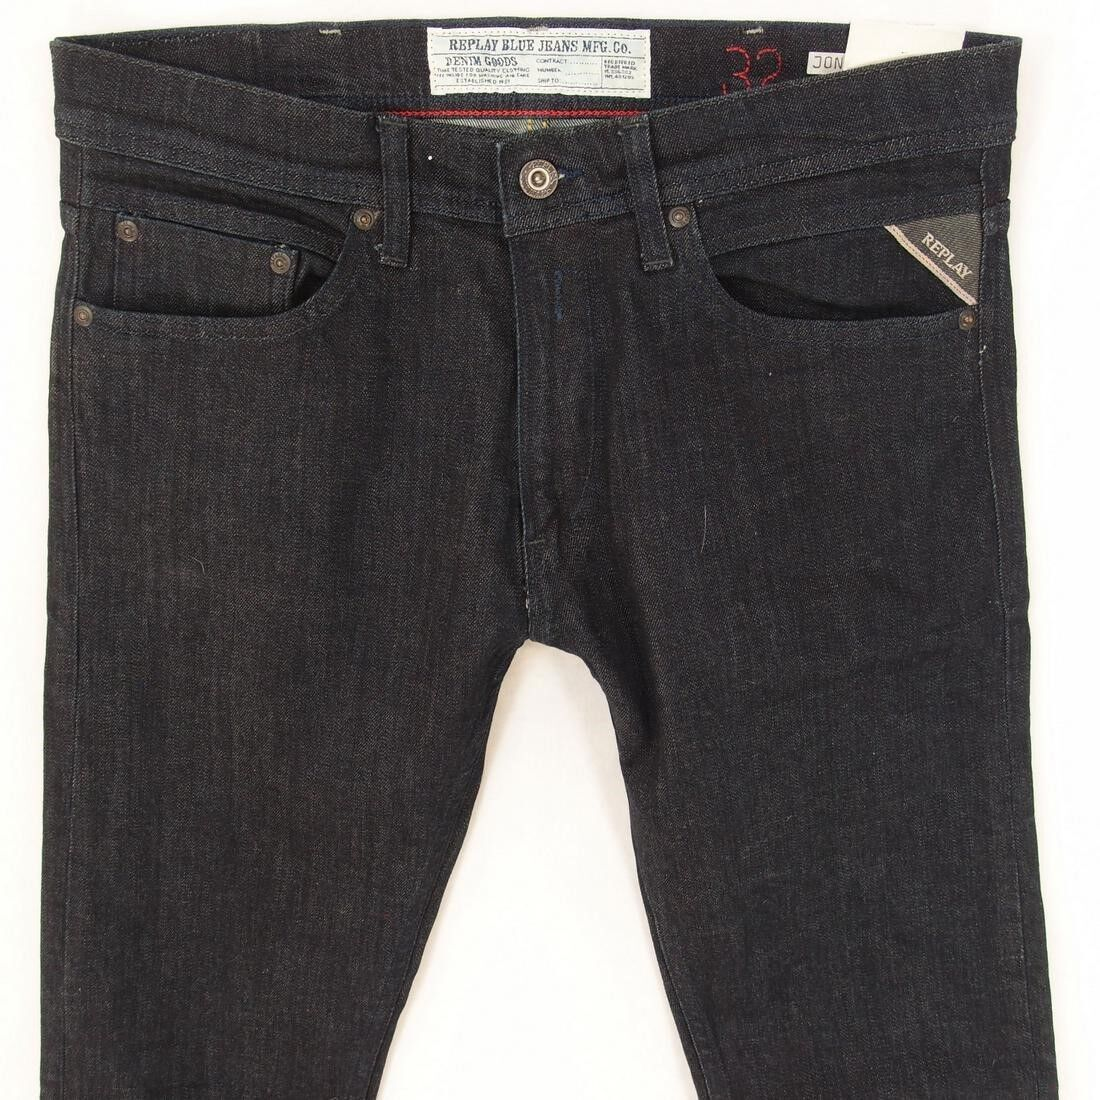 big sale 849c3 abf4a Details about NEW Mens Replay MA931 JONDRILL Stretch Skinny Blue Jeans W32  L34 BNWT